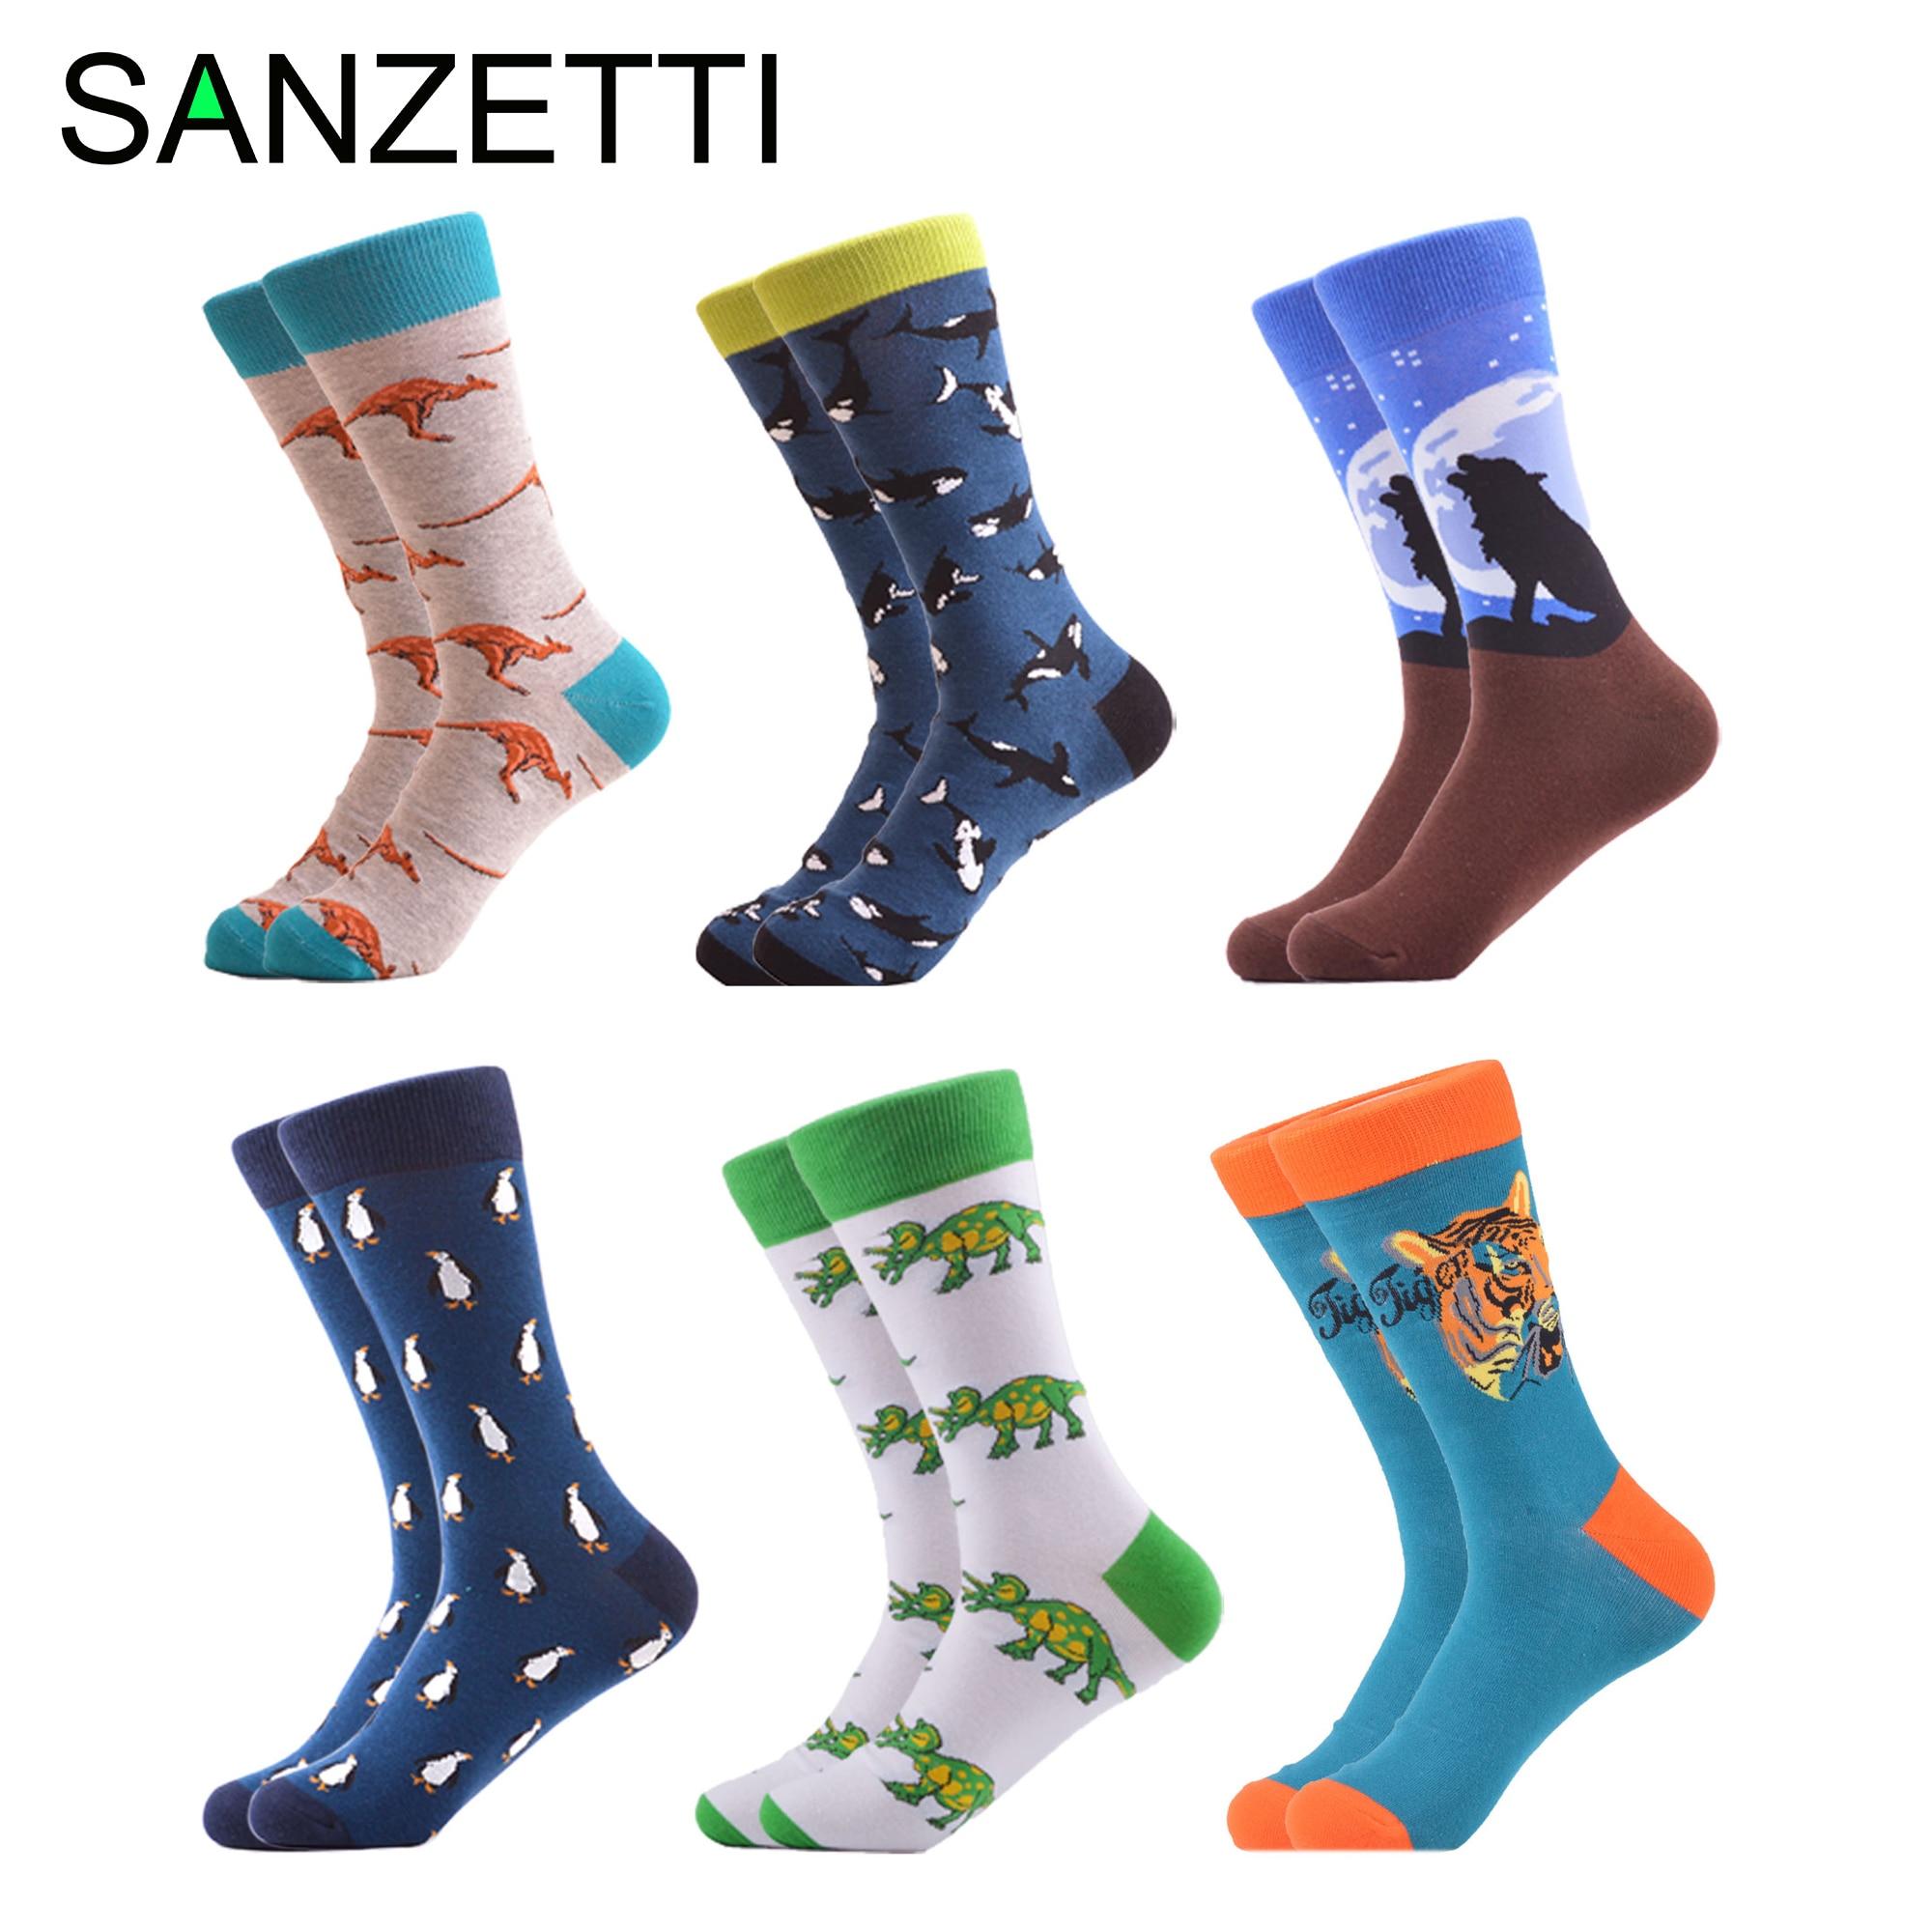 SANZETTI 6 Pair/lot Novelty Hip Hop Starry Sky Striped Pattern Men's Funny Crew Socks Combed Cotton Causal Dress Wedding Socks